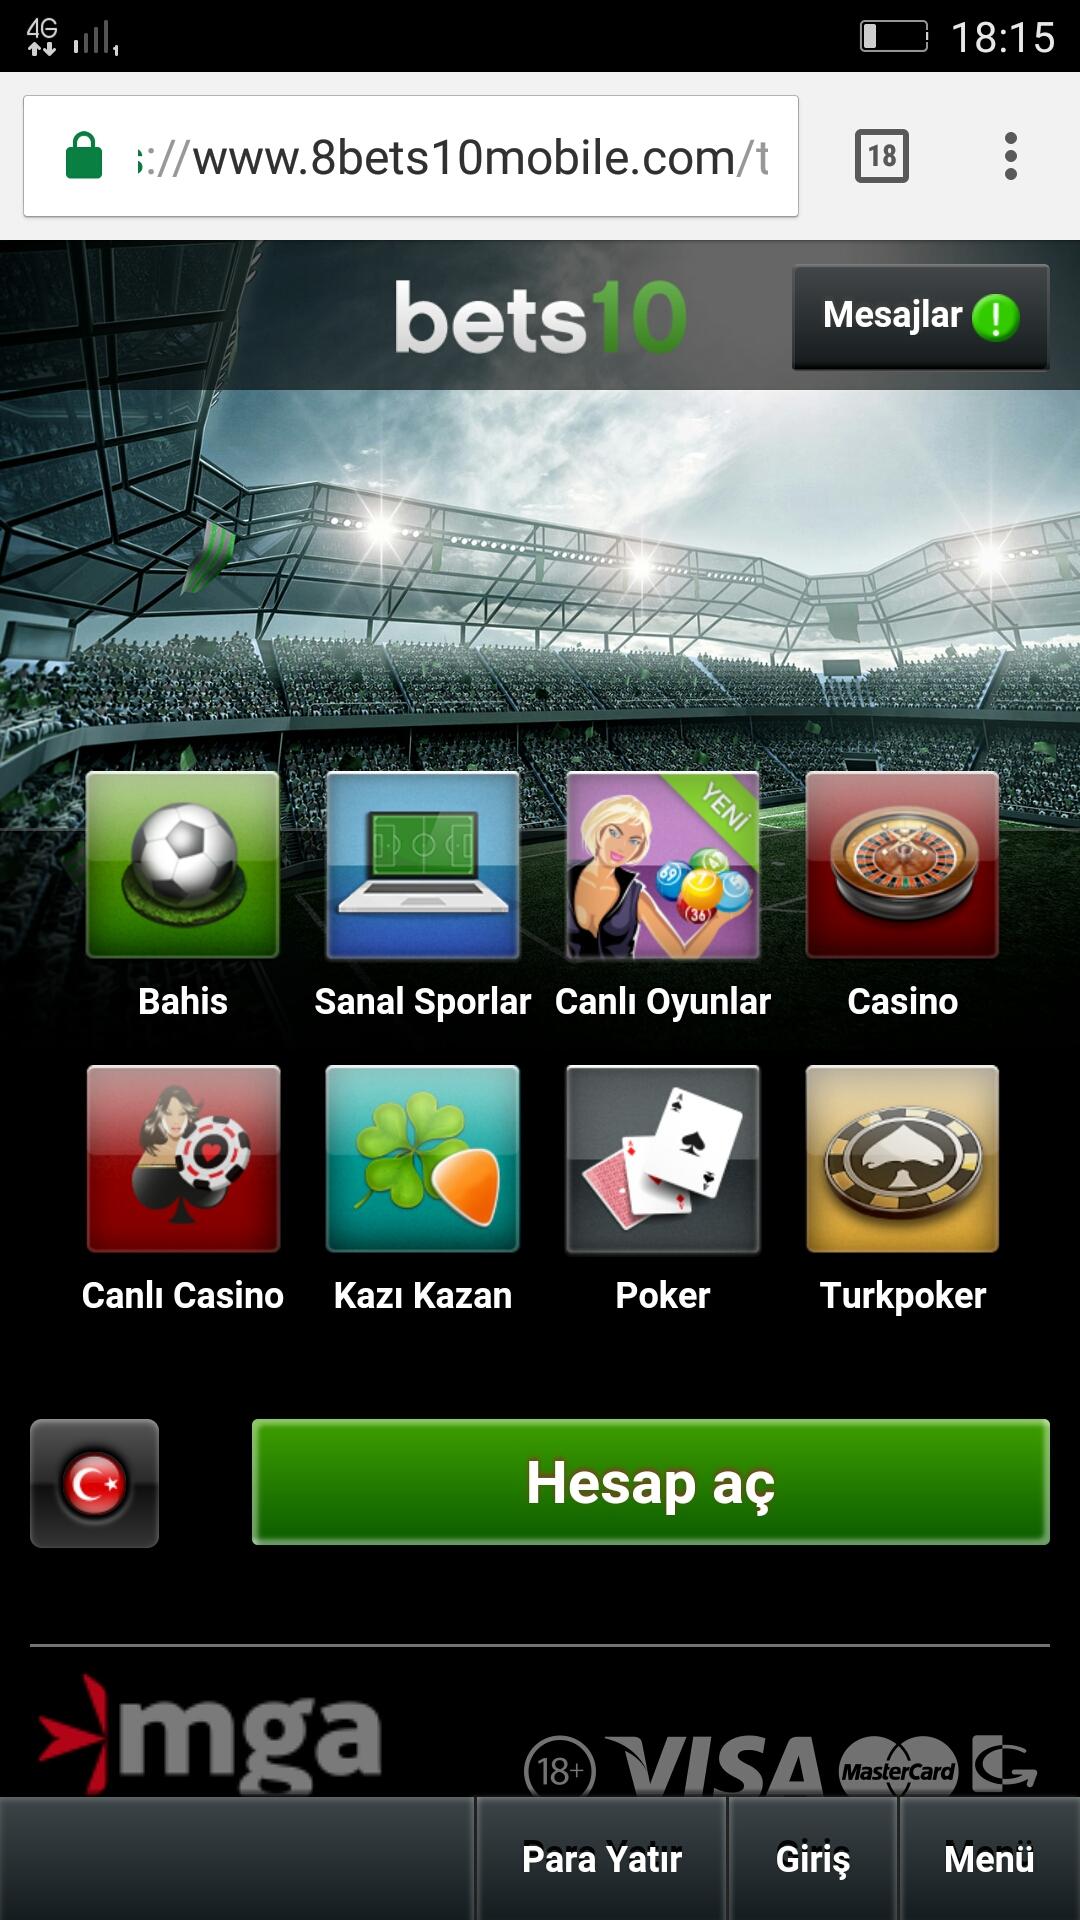 9Bets10Mobile.com Yeni Bets10 Mobile Adresi